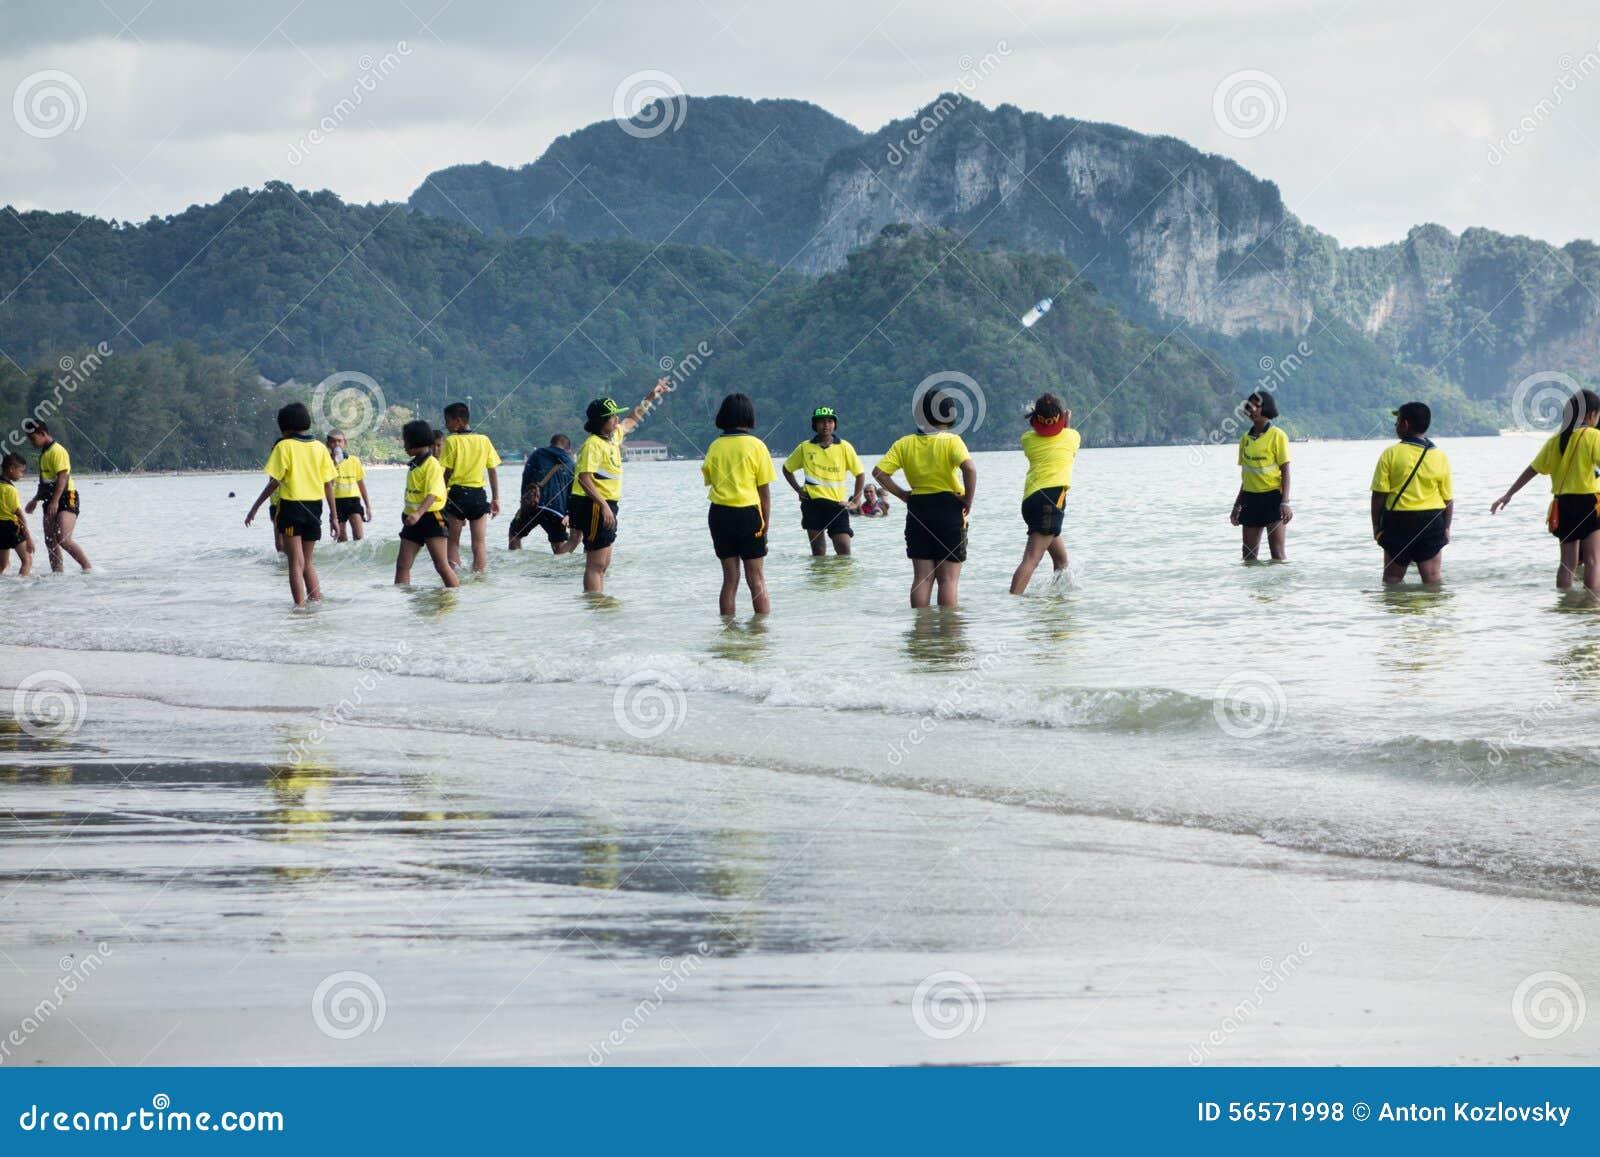 Download Ταϊλανδικά Schoolkids που παίζουν στην παραλία Εκδοτική Στοκ Εικόνες - εικόνα από παπούτσια, σχολείο: 56571998